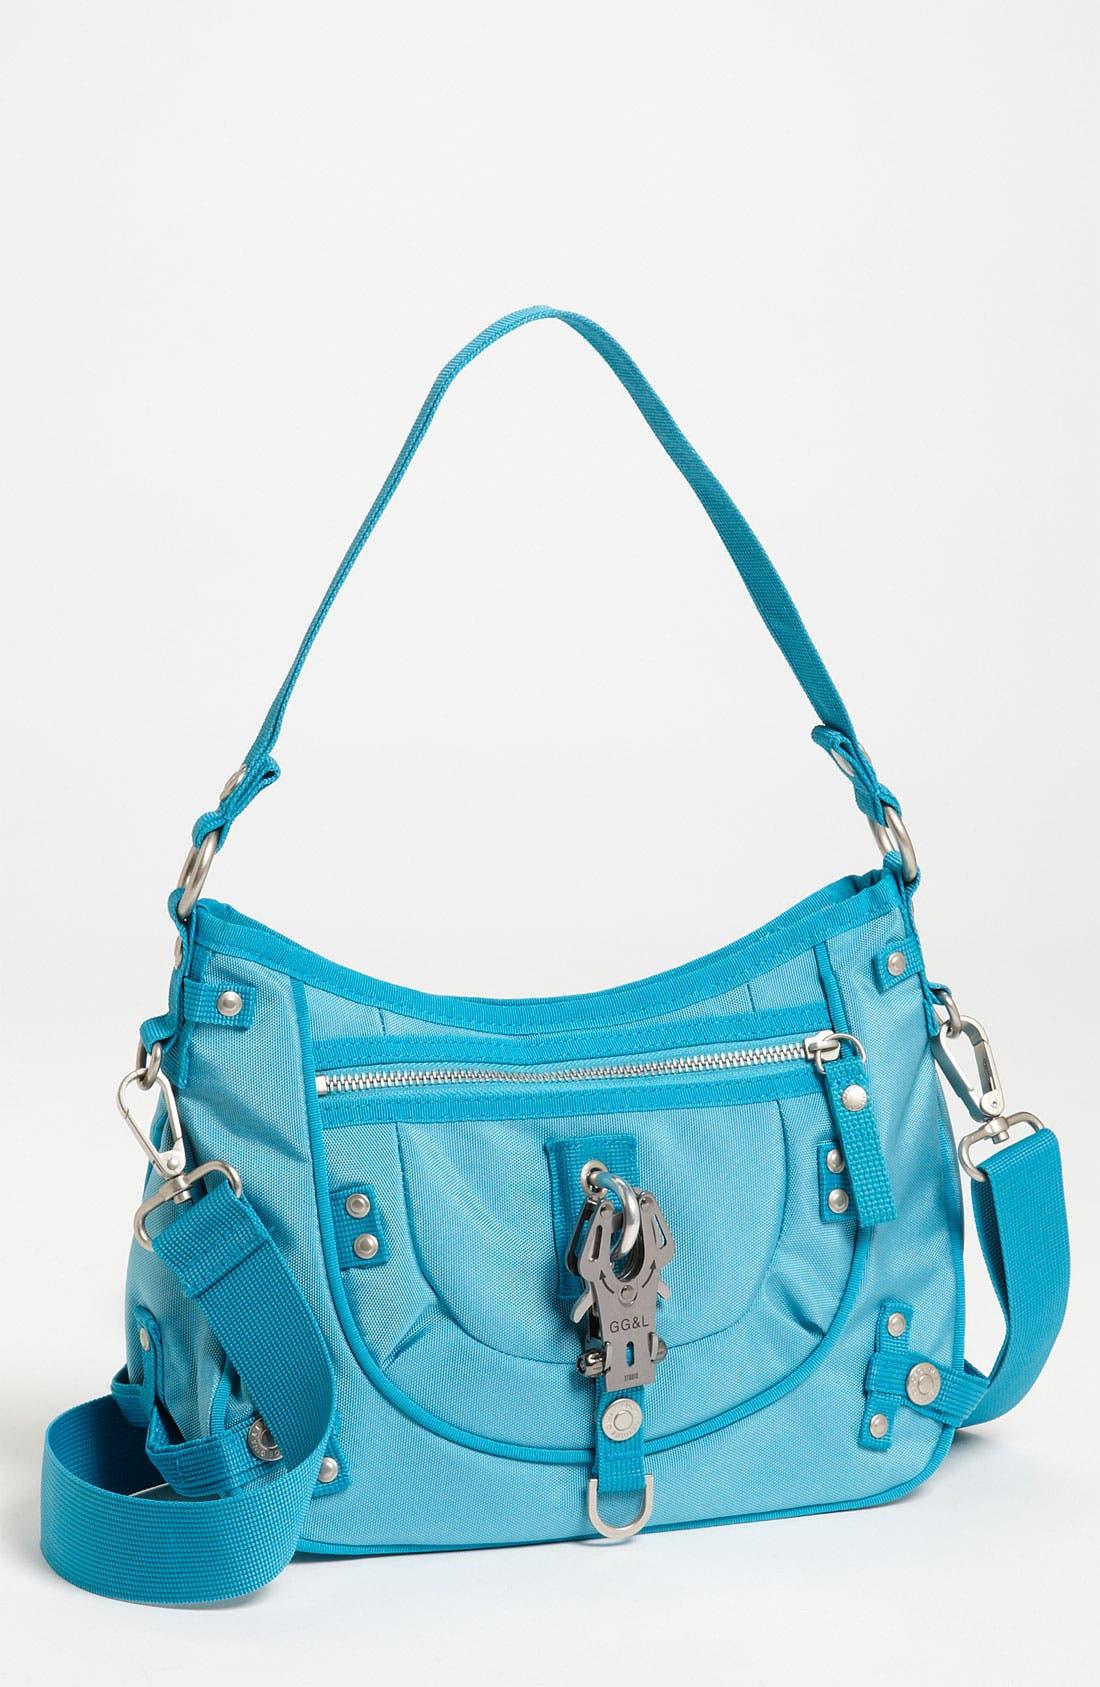 Alternate Image 1 Selected - George Gina & Lucy 'Me Lalaland -  Mini' Shoulder Bag